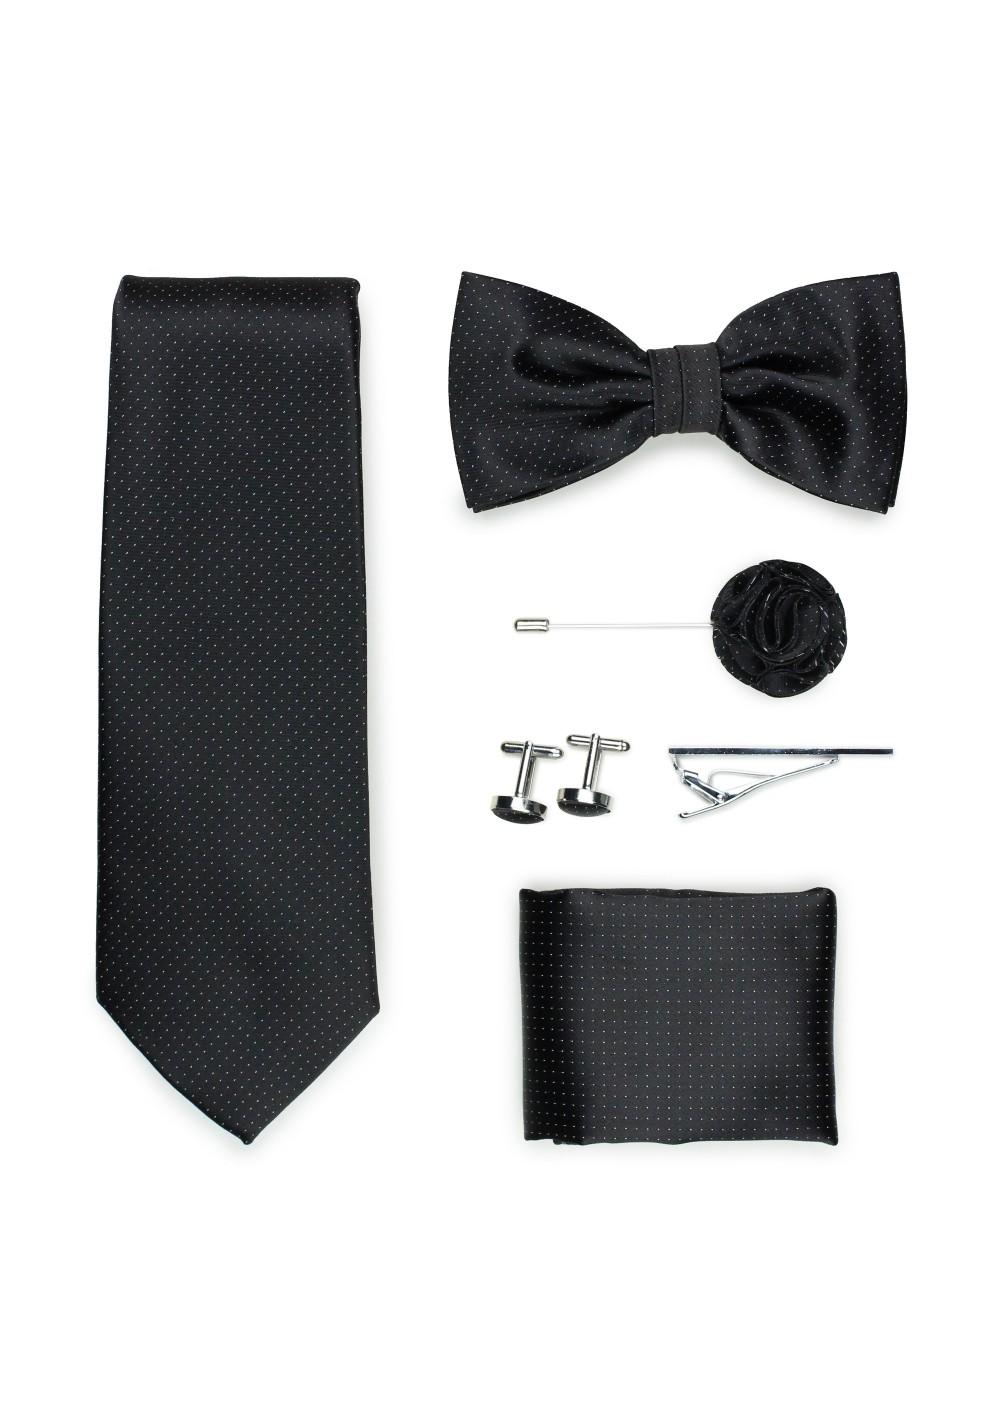 jet black menswear accessory set